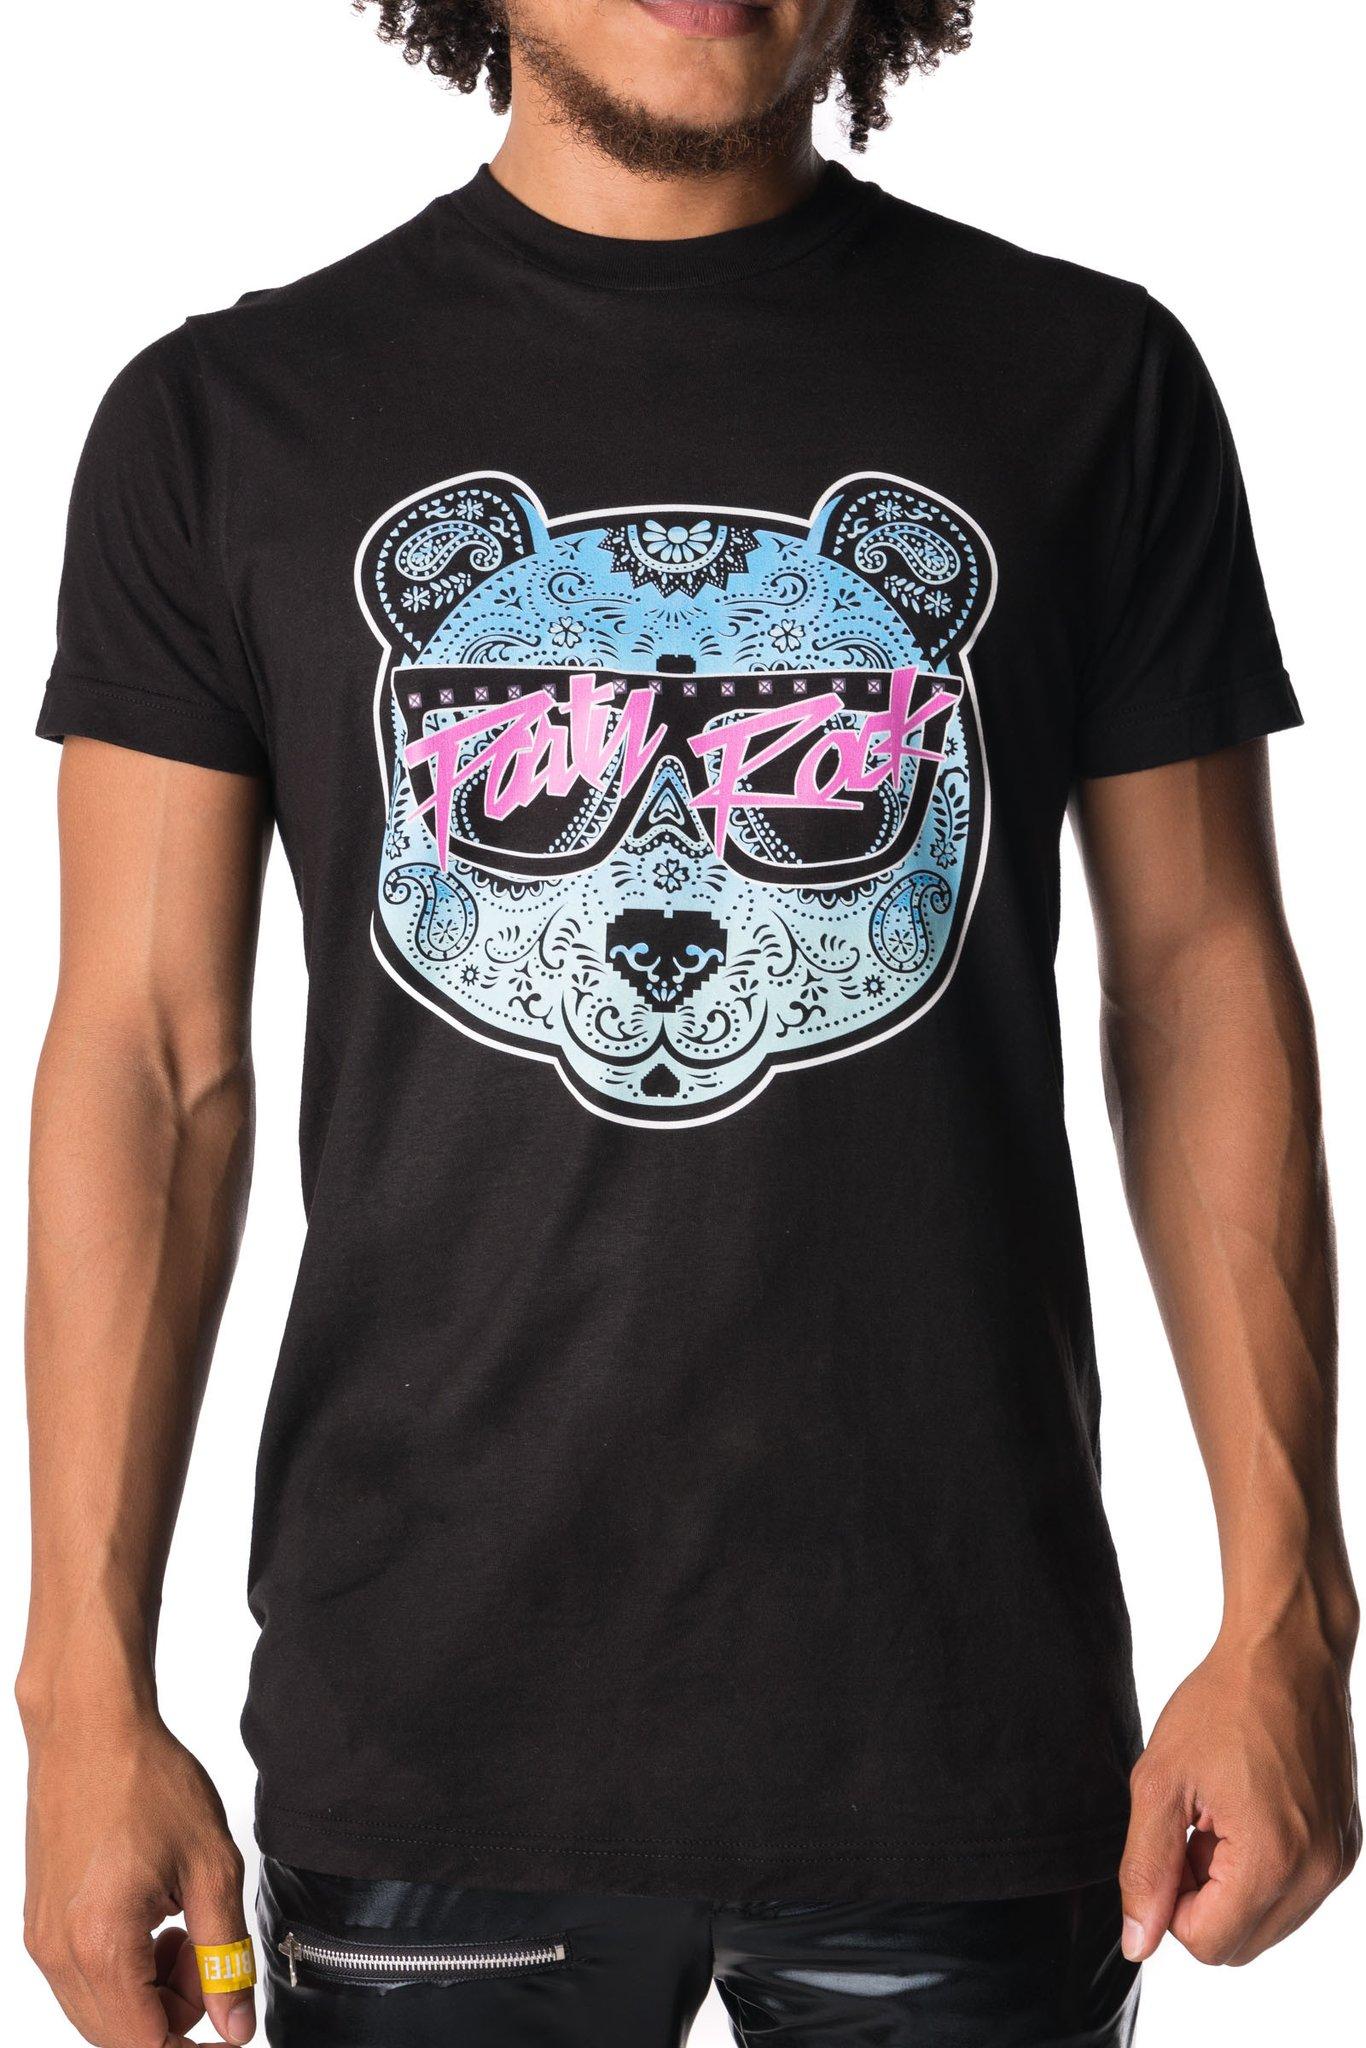 Party Rock Clothing★パーティーロッククロッシング ★Party Rock Panda T-Shirt